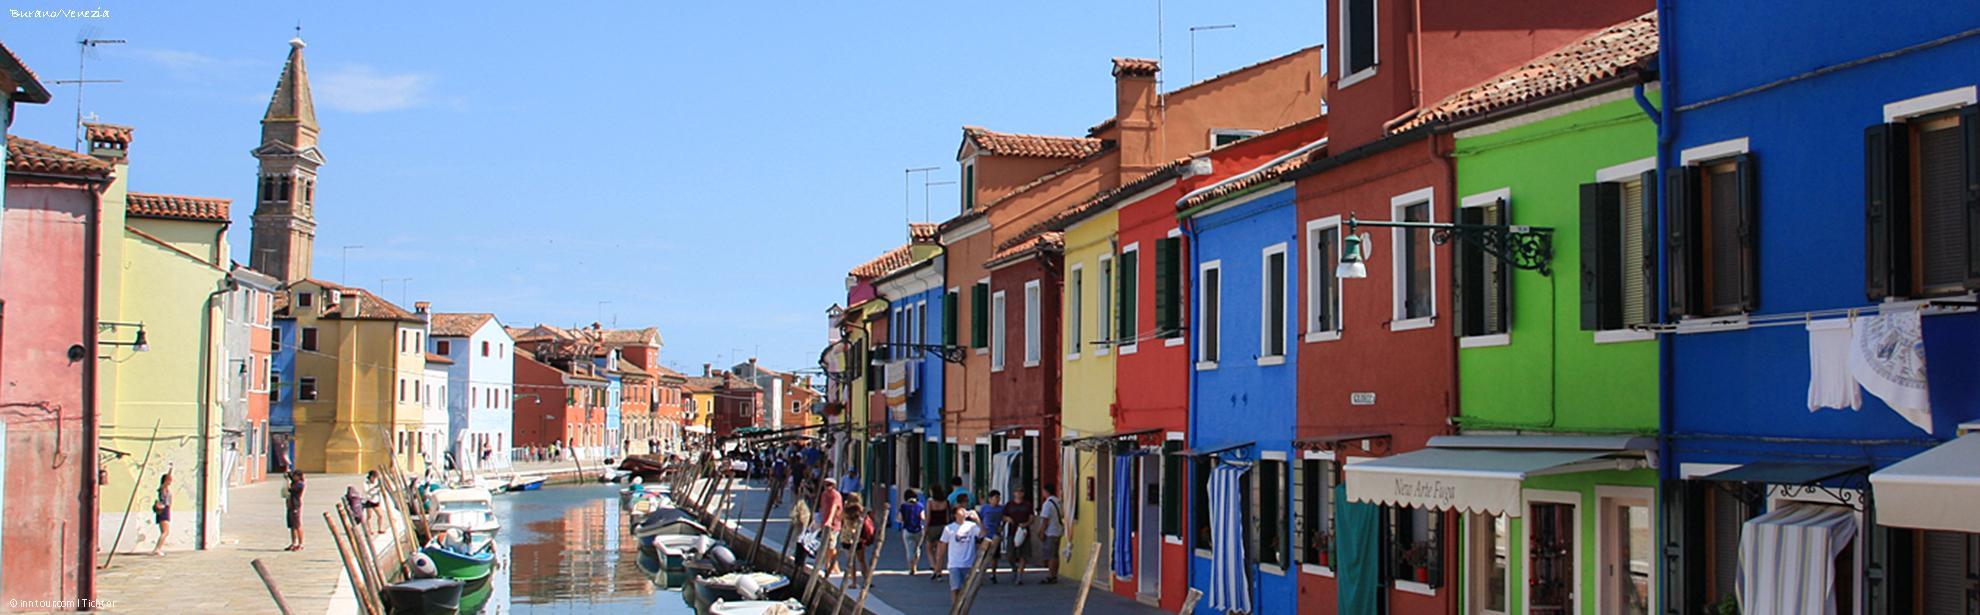 Oklassinntour_Tichter_Burano-Venezia_IMG_3560